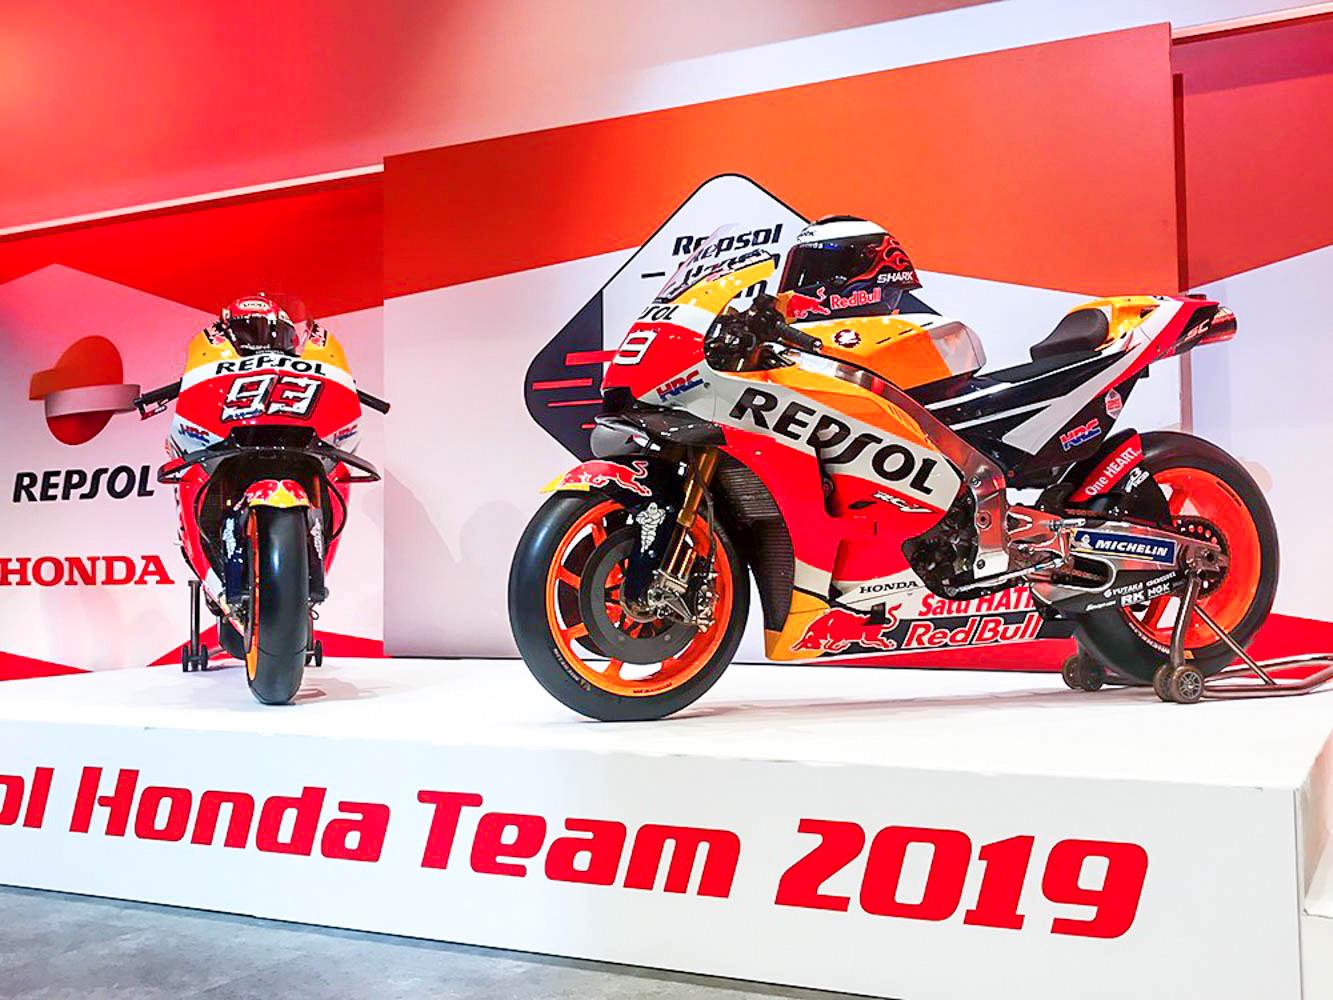 MotoGP : Tim pabrikan HRC Honda resmi perkenalkan Honda RC213V 2019 !